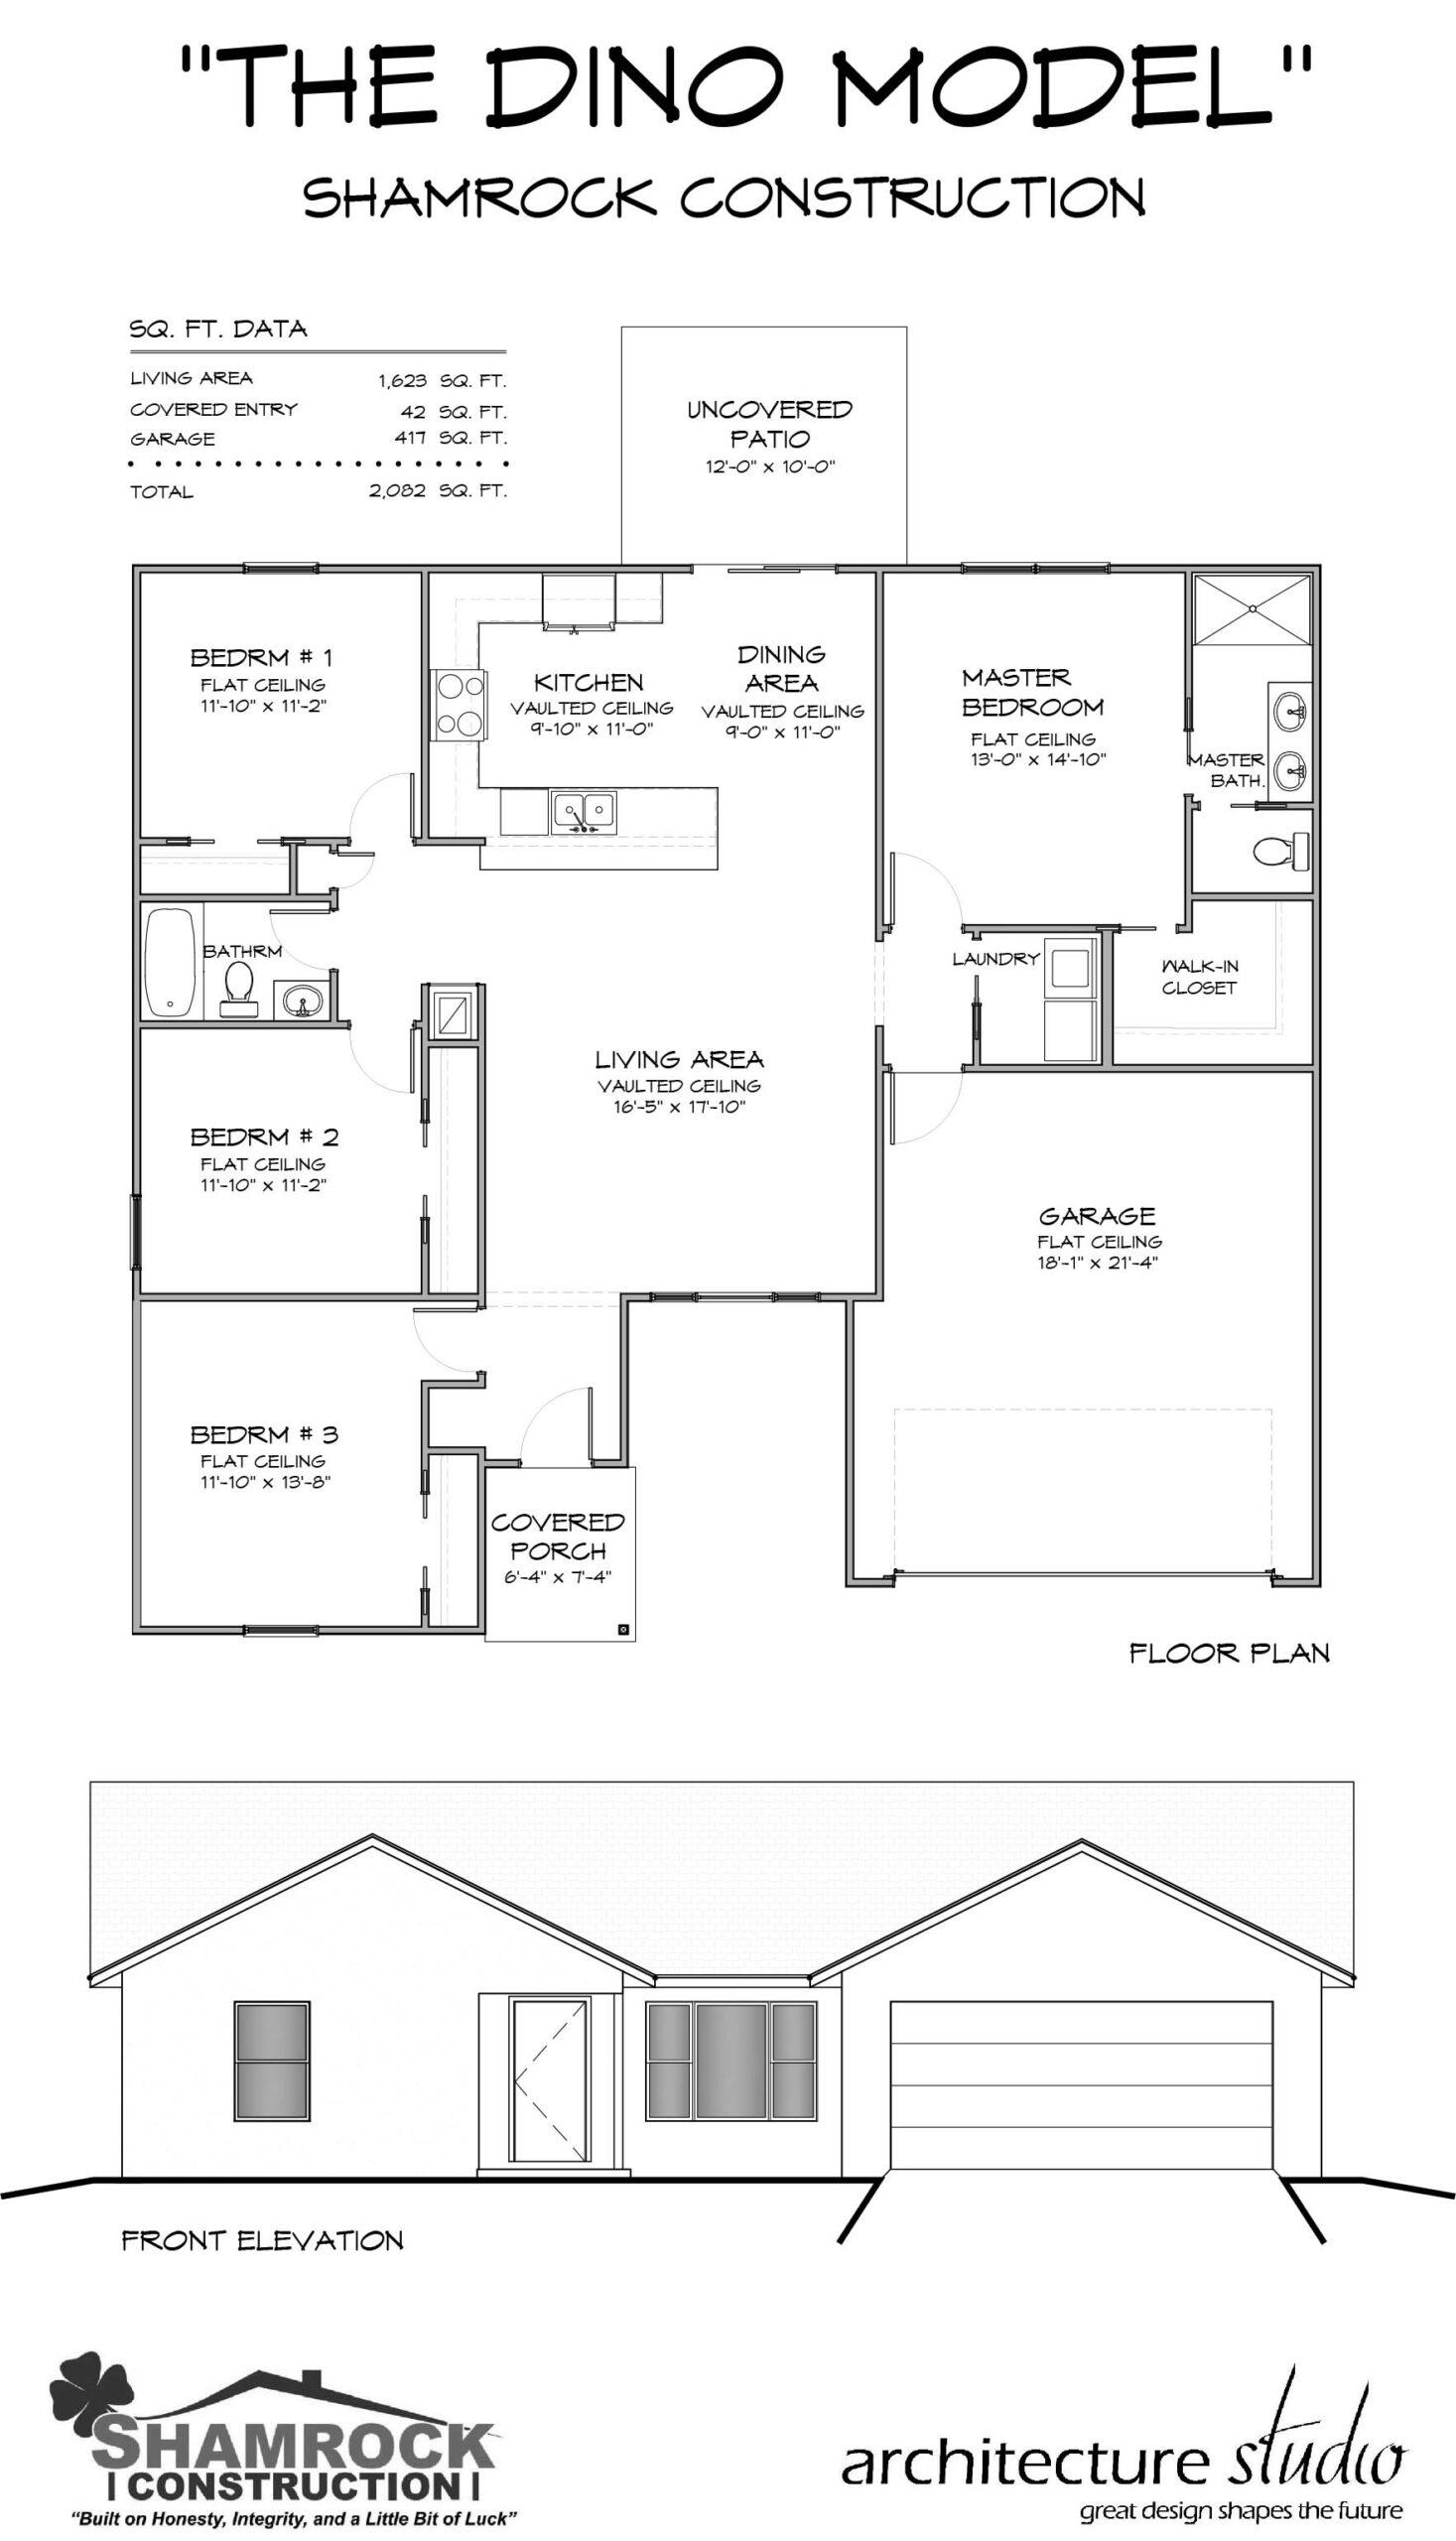 Dino Model Home - Shamrock Construction